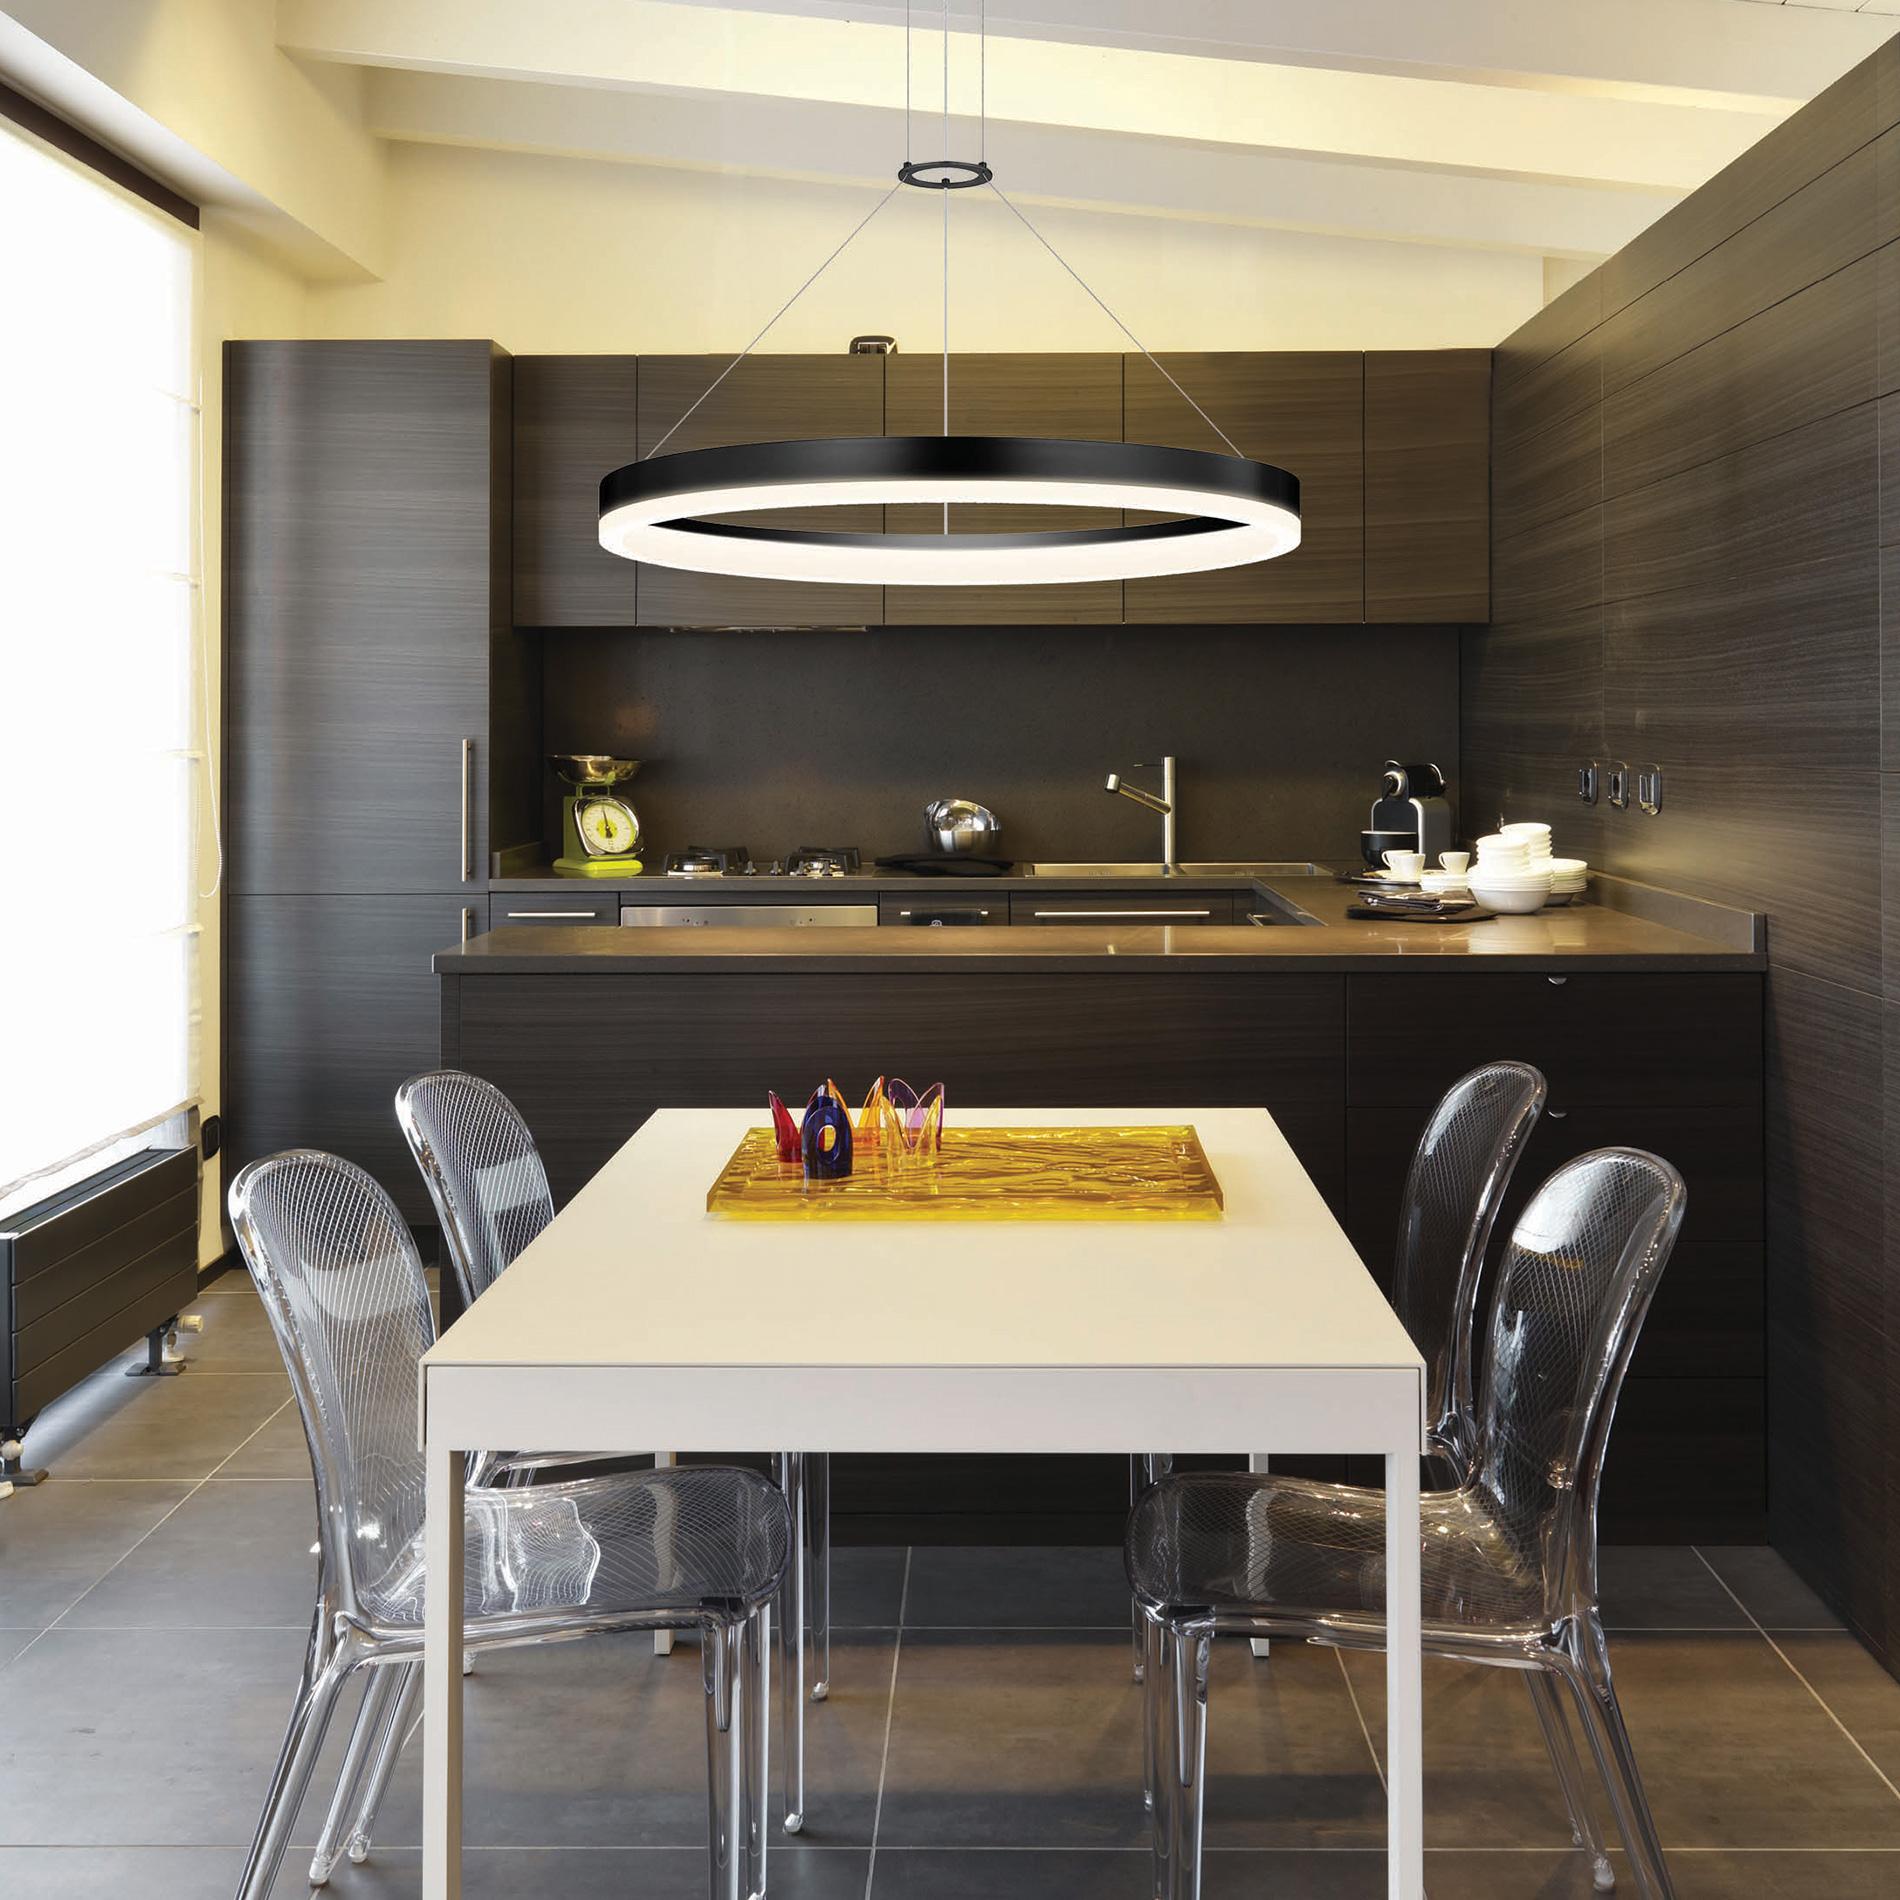 Dining Room With Interior Light Design